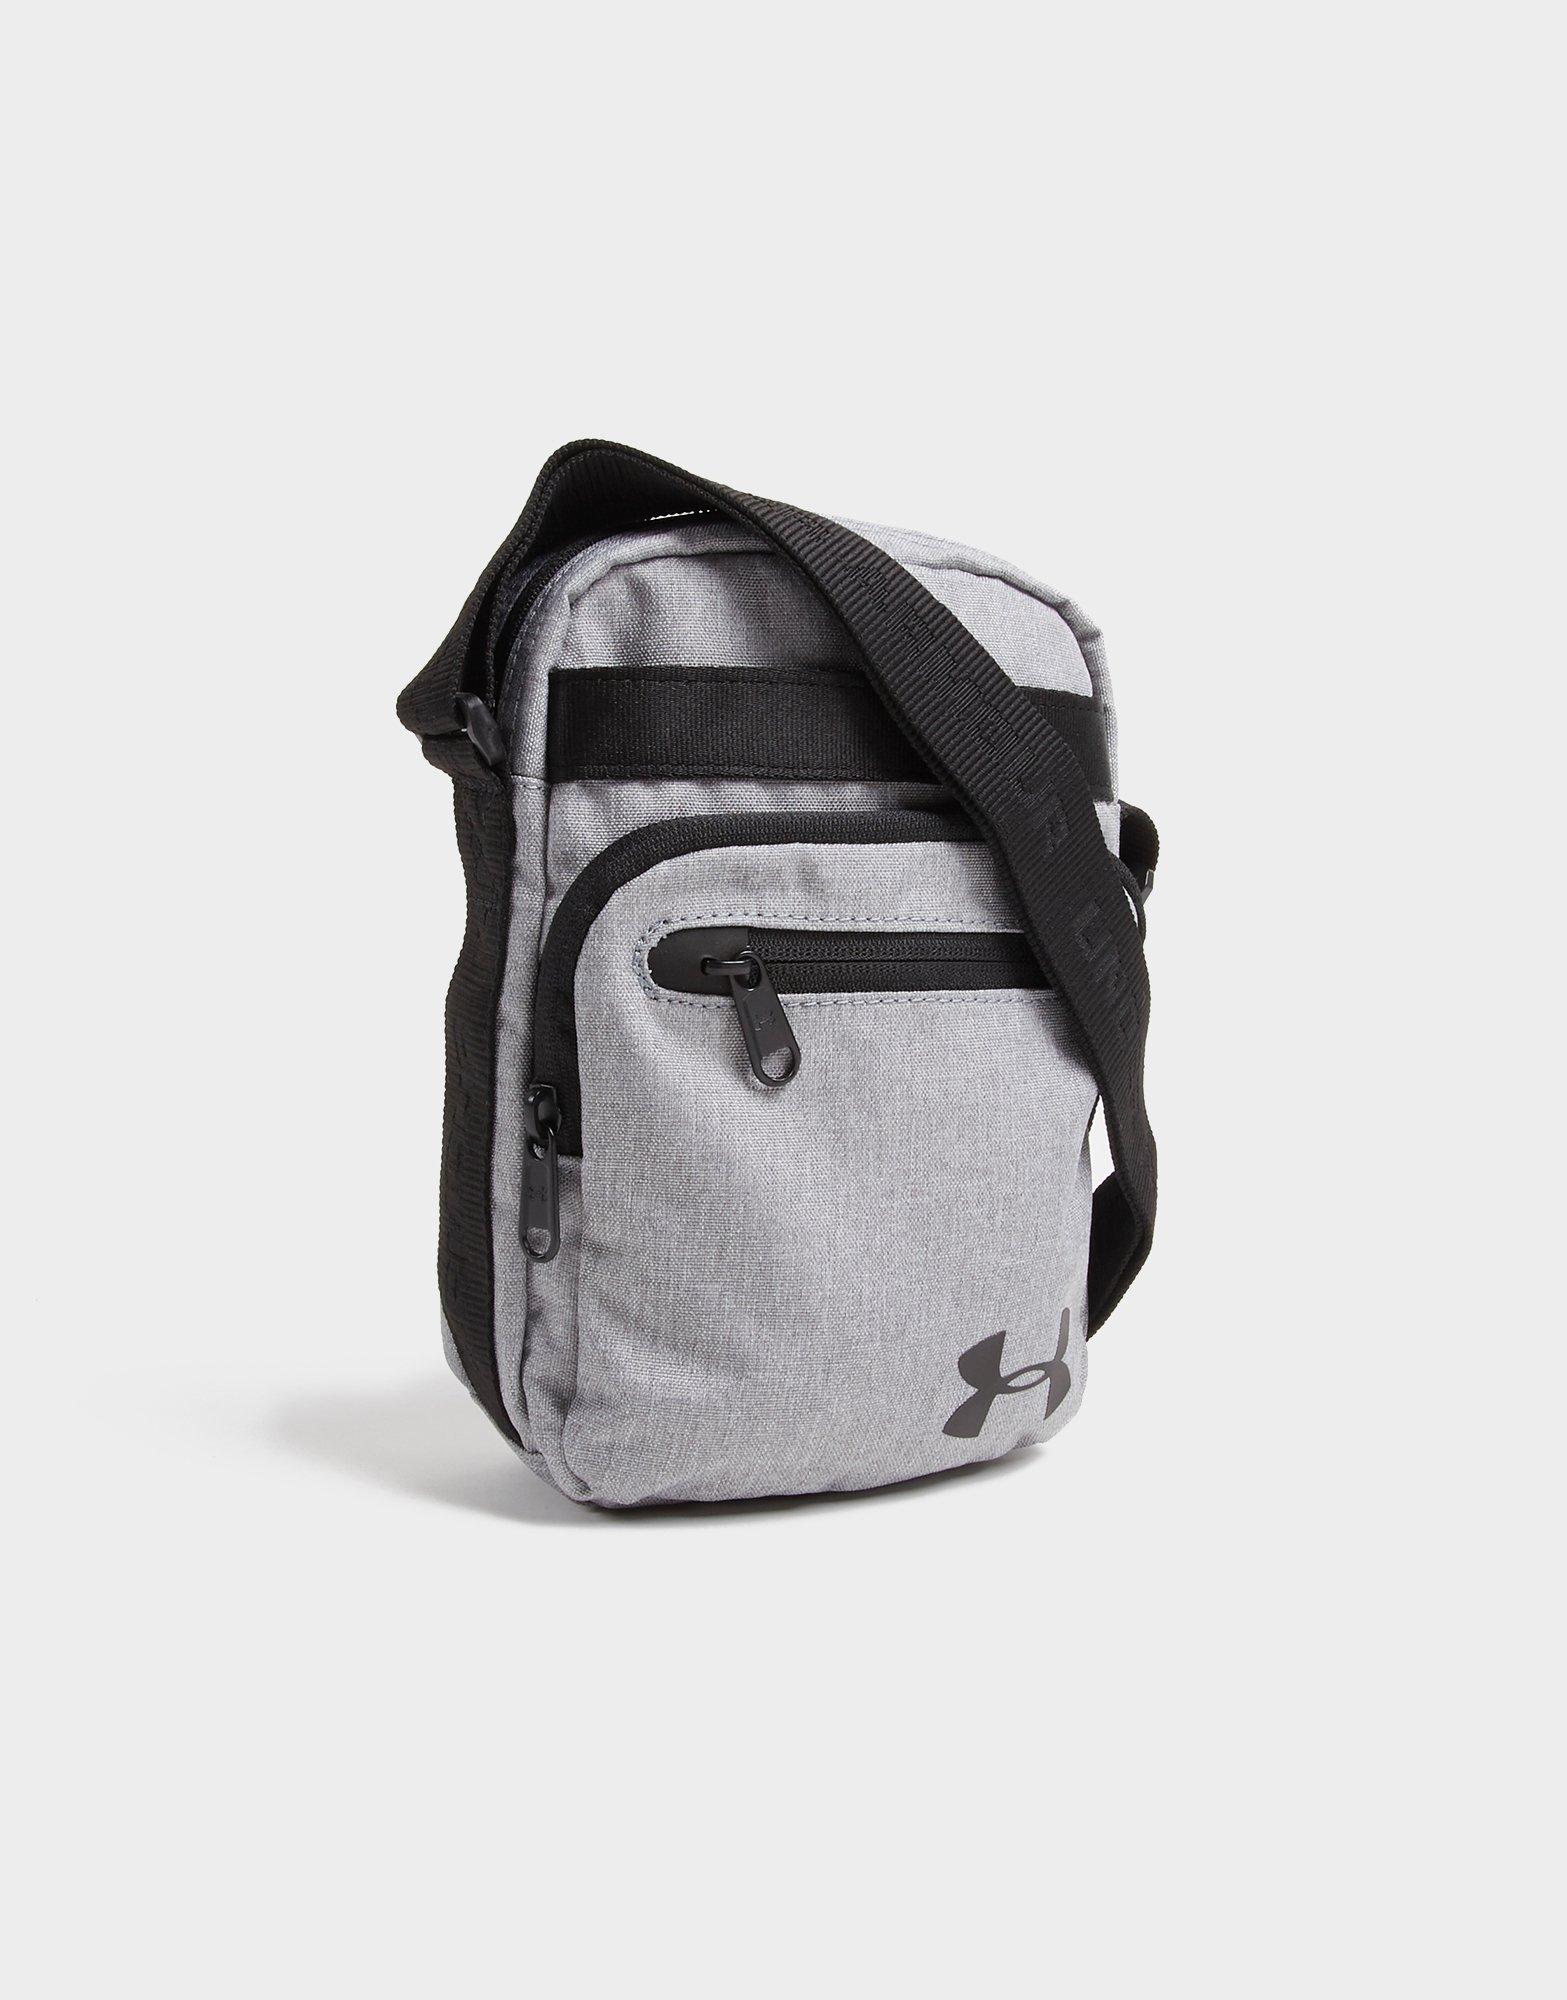 380d74c1236 UNDER ARMOUR Crossbody Bag | JD Sports